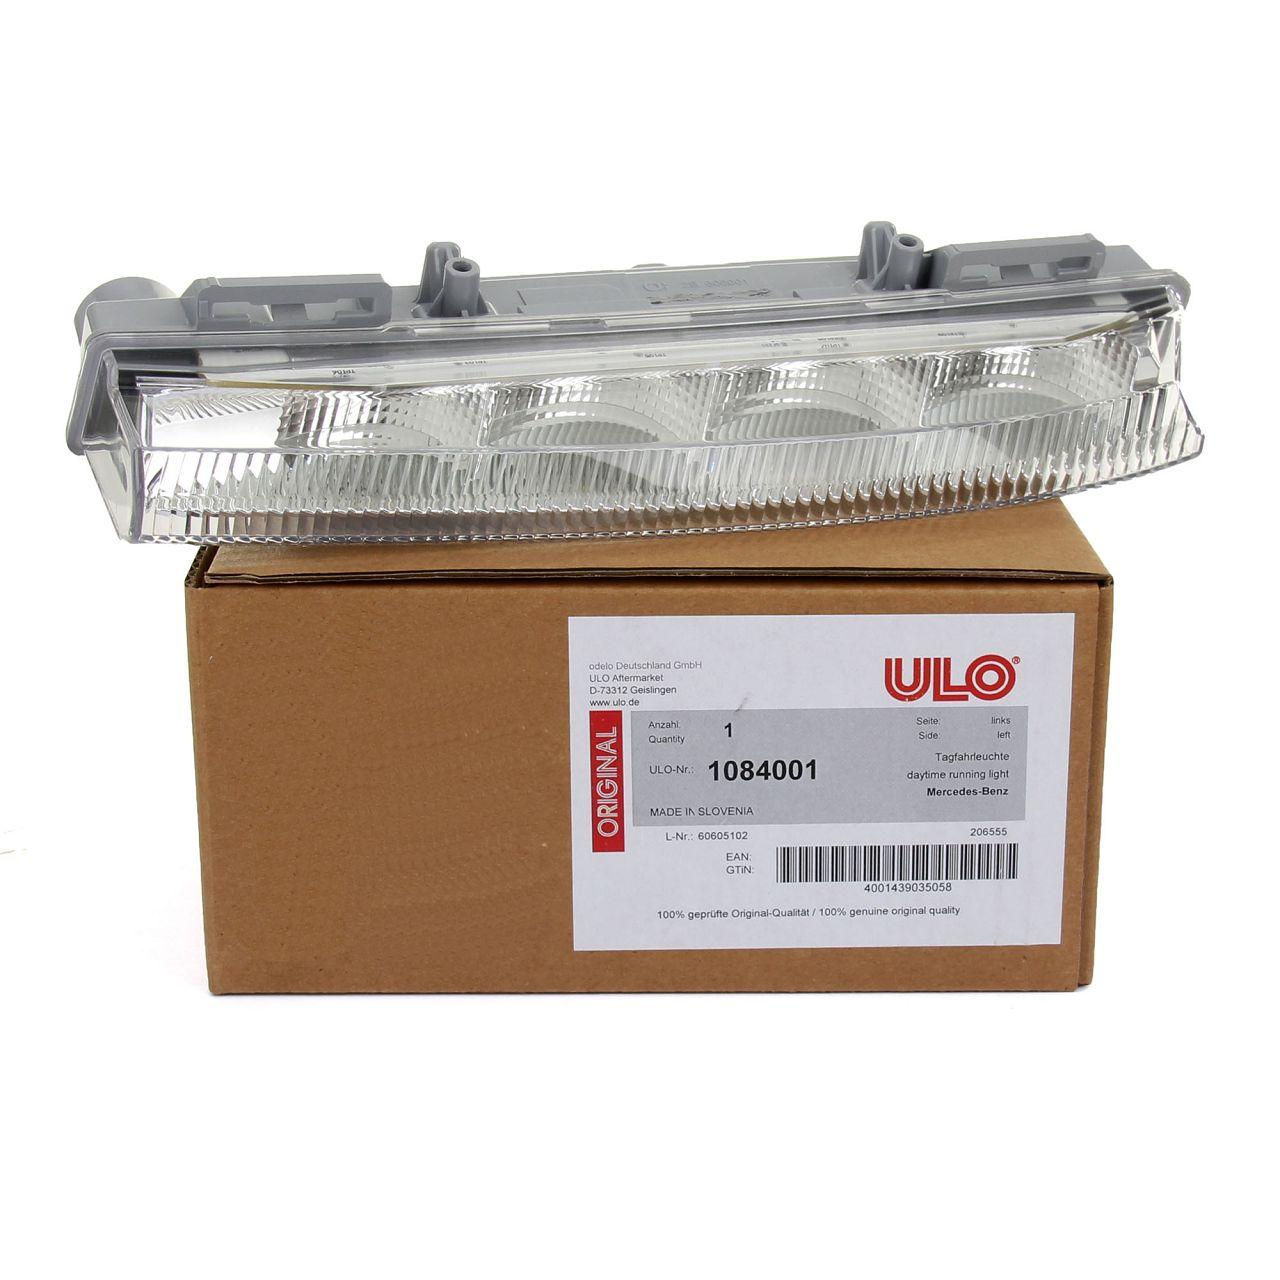 ULO Tagfahrlicht Tagfahrleuchte LED 1084001 C-Klasse E-Klasse vorne links